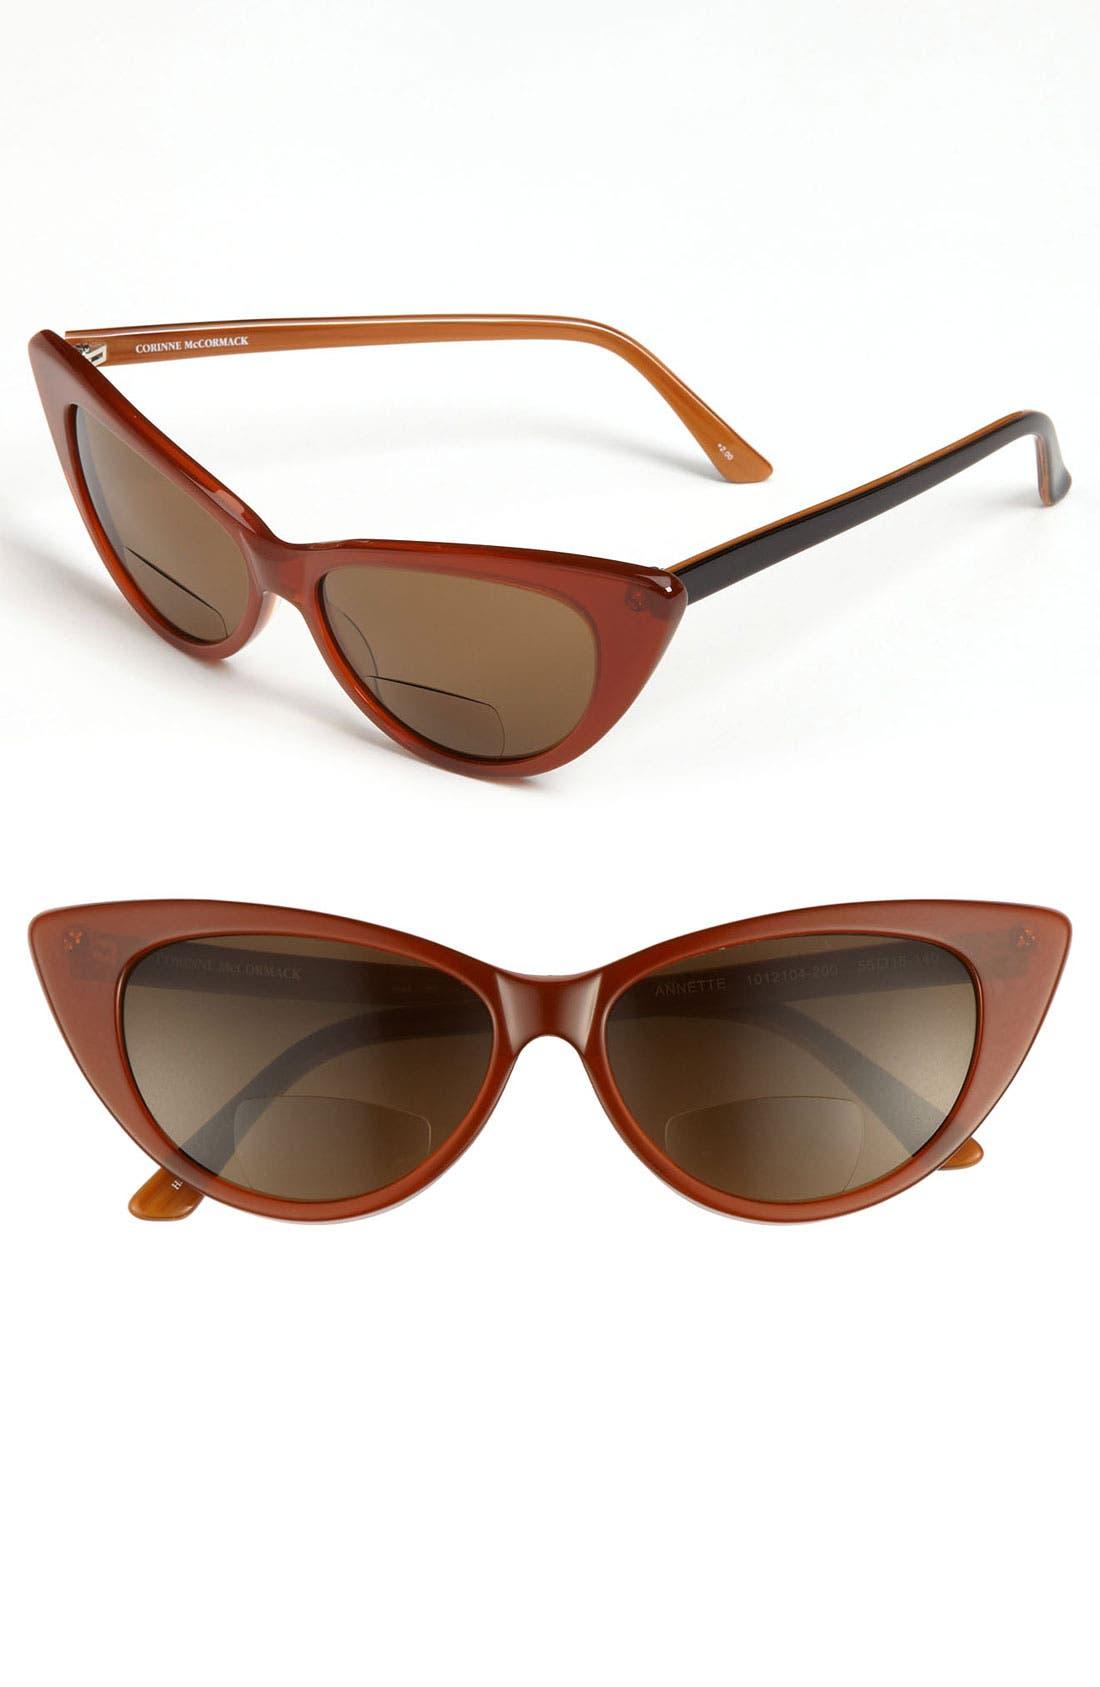 Alternate Image 1 Selected - Corinne McCormack Bifocal Reading Sunglasses